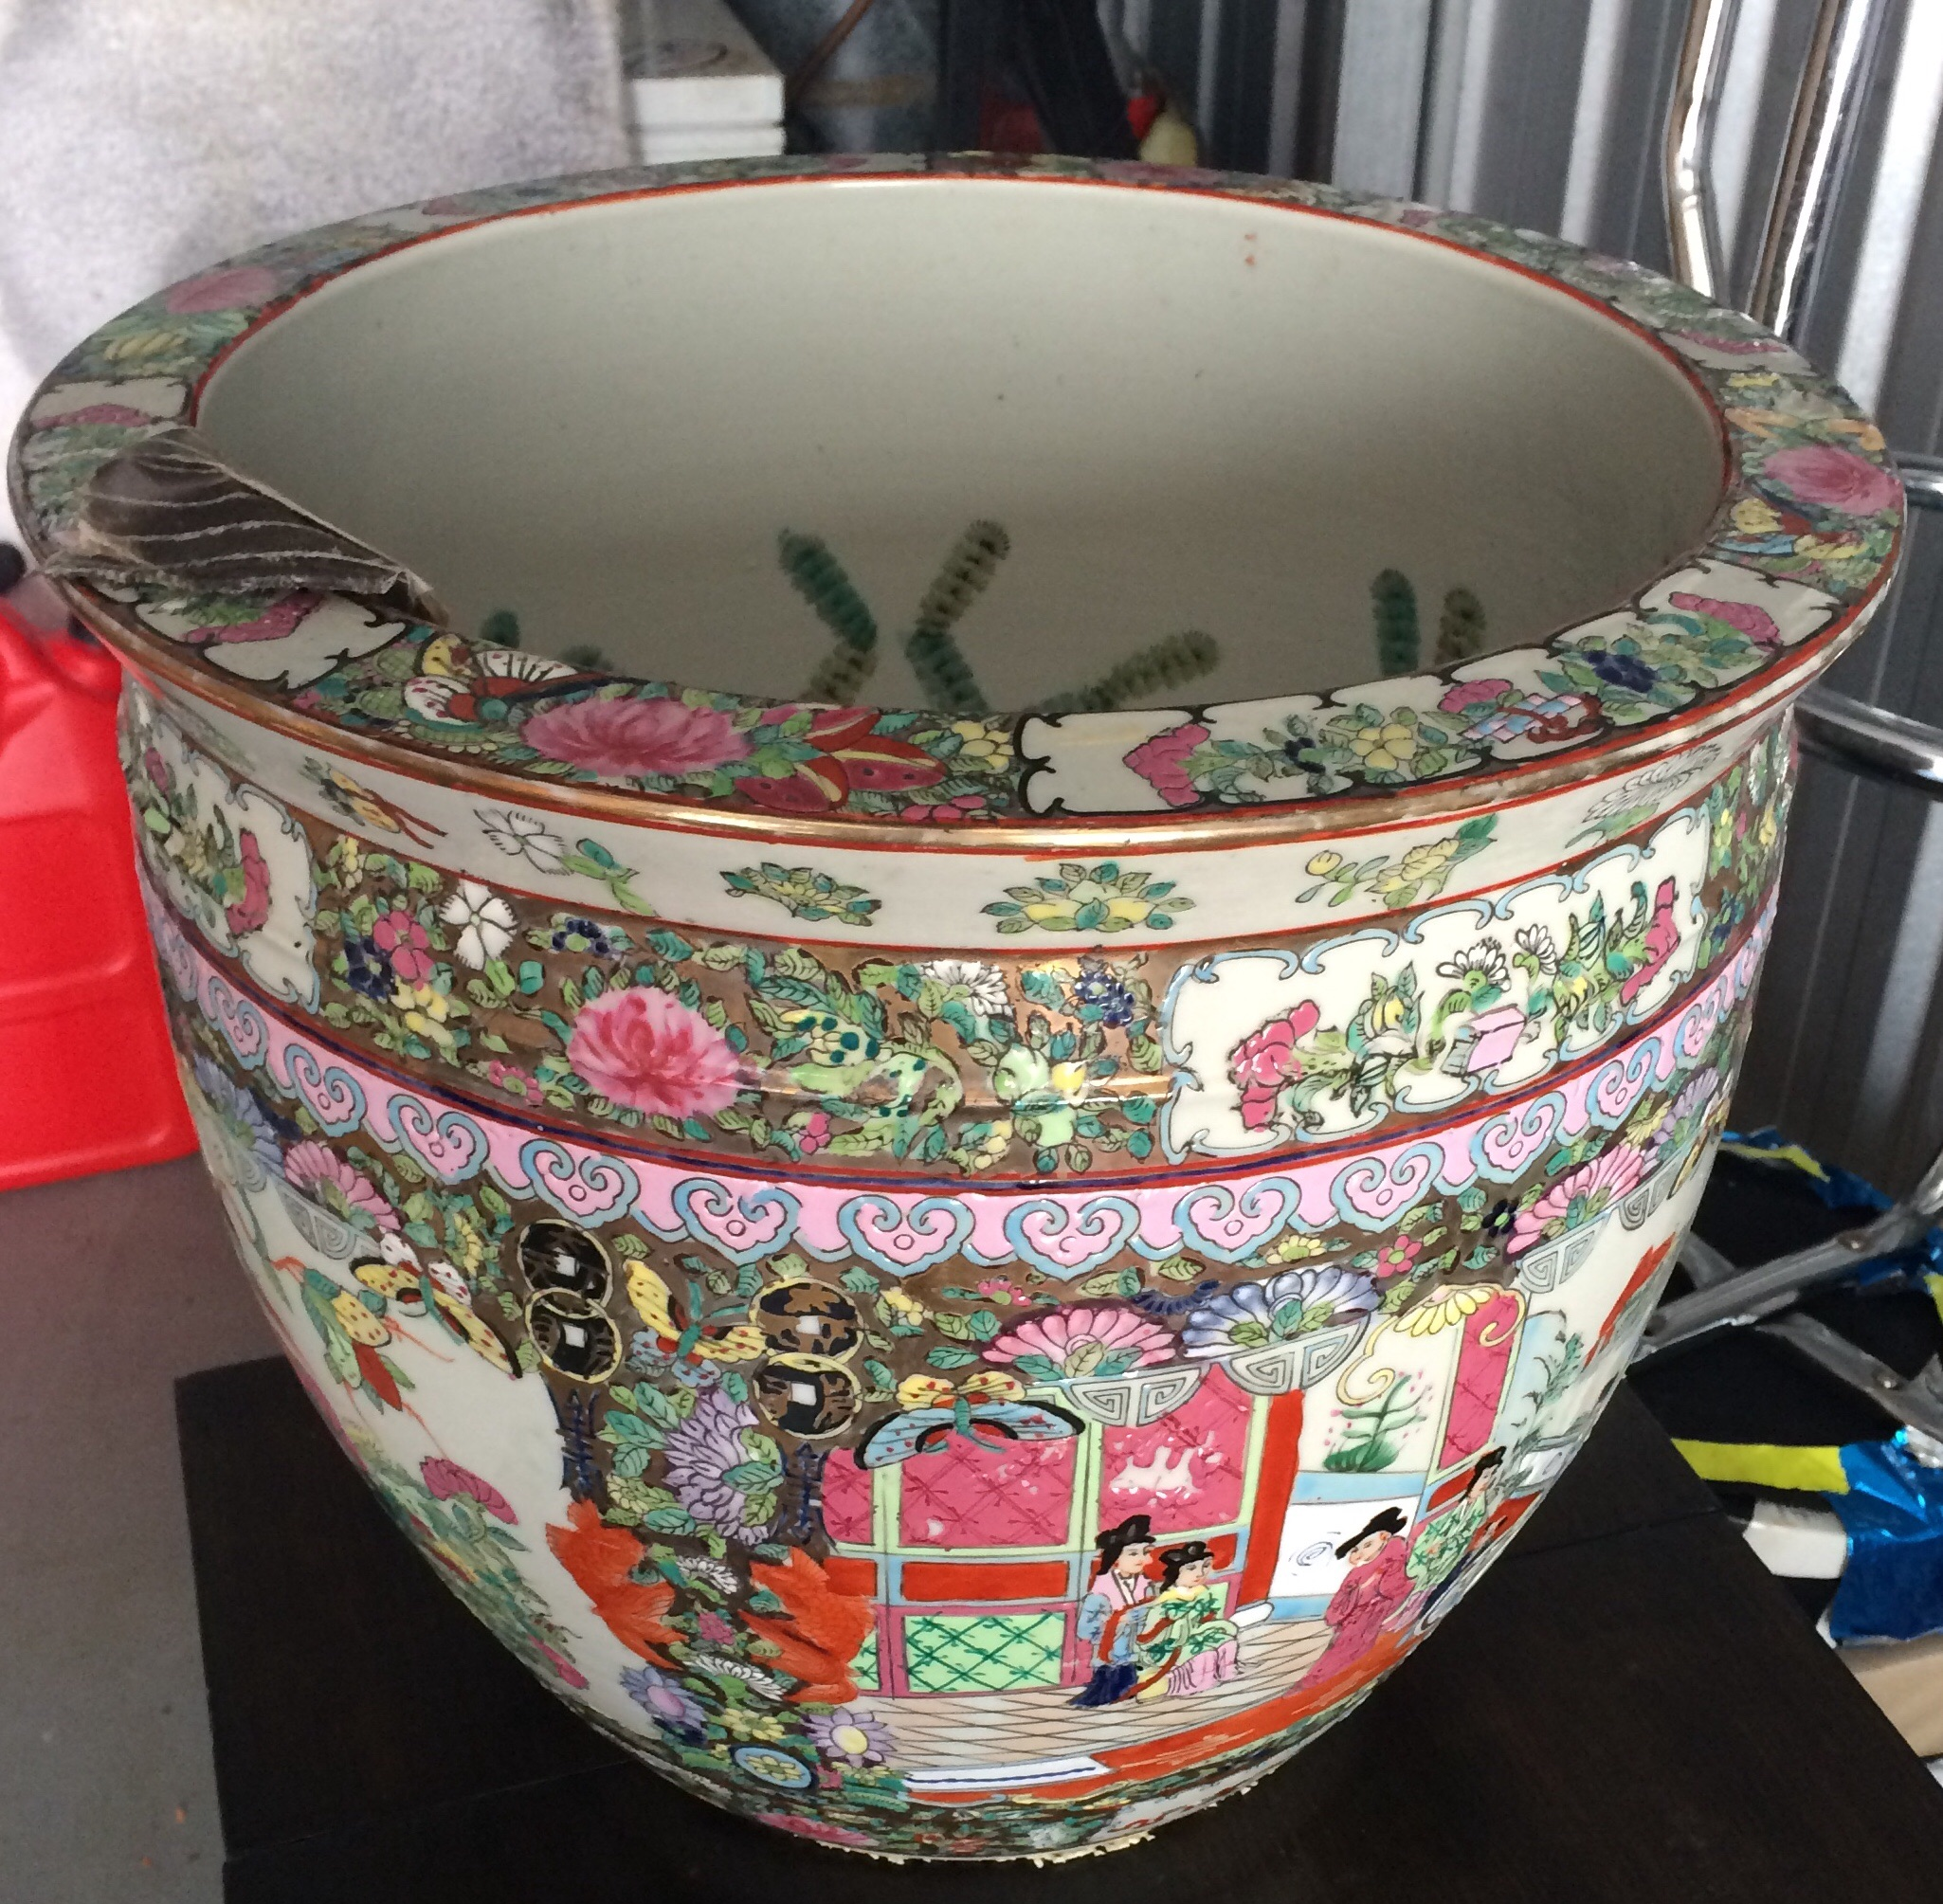 Chinese Fish Bowl Planter Antique Appraisal Instappraisal